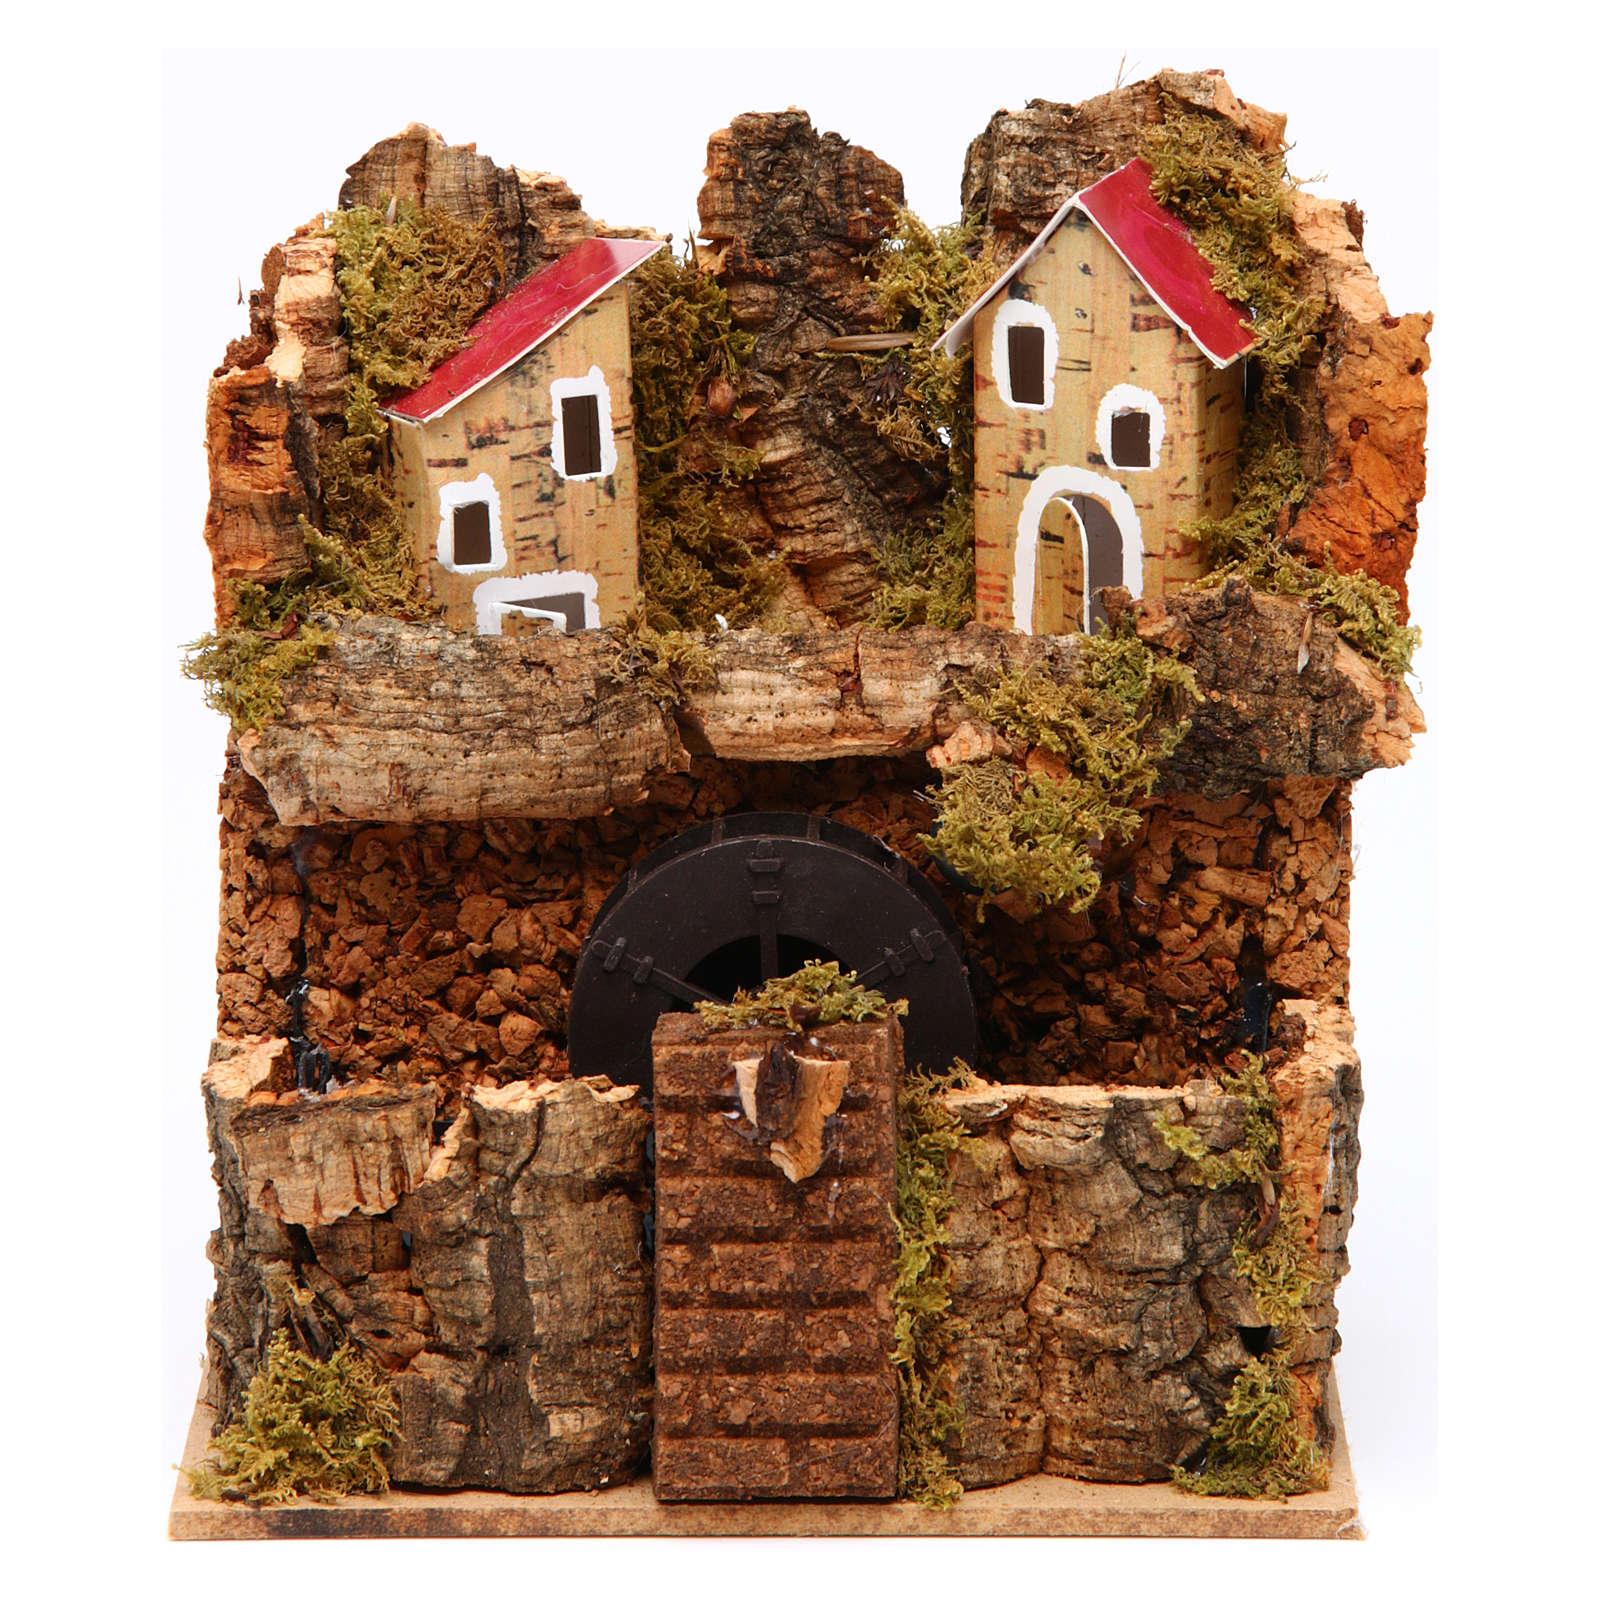 Watermill 15x15x10 cm for Neapolitan Nativity Scene 4